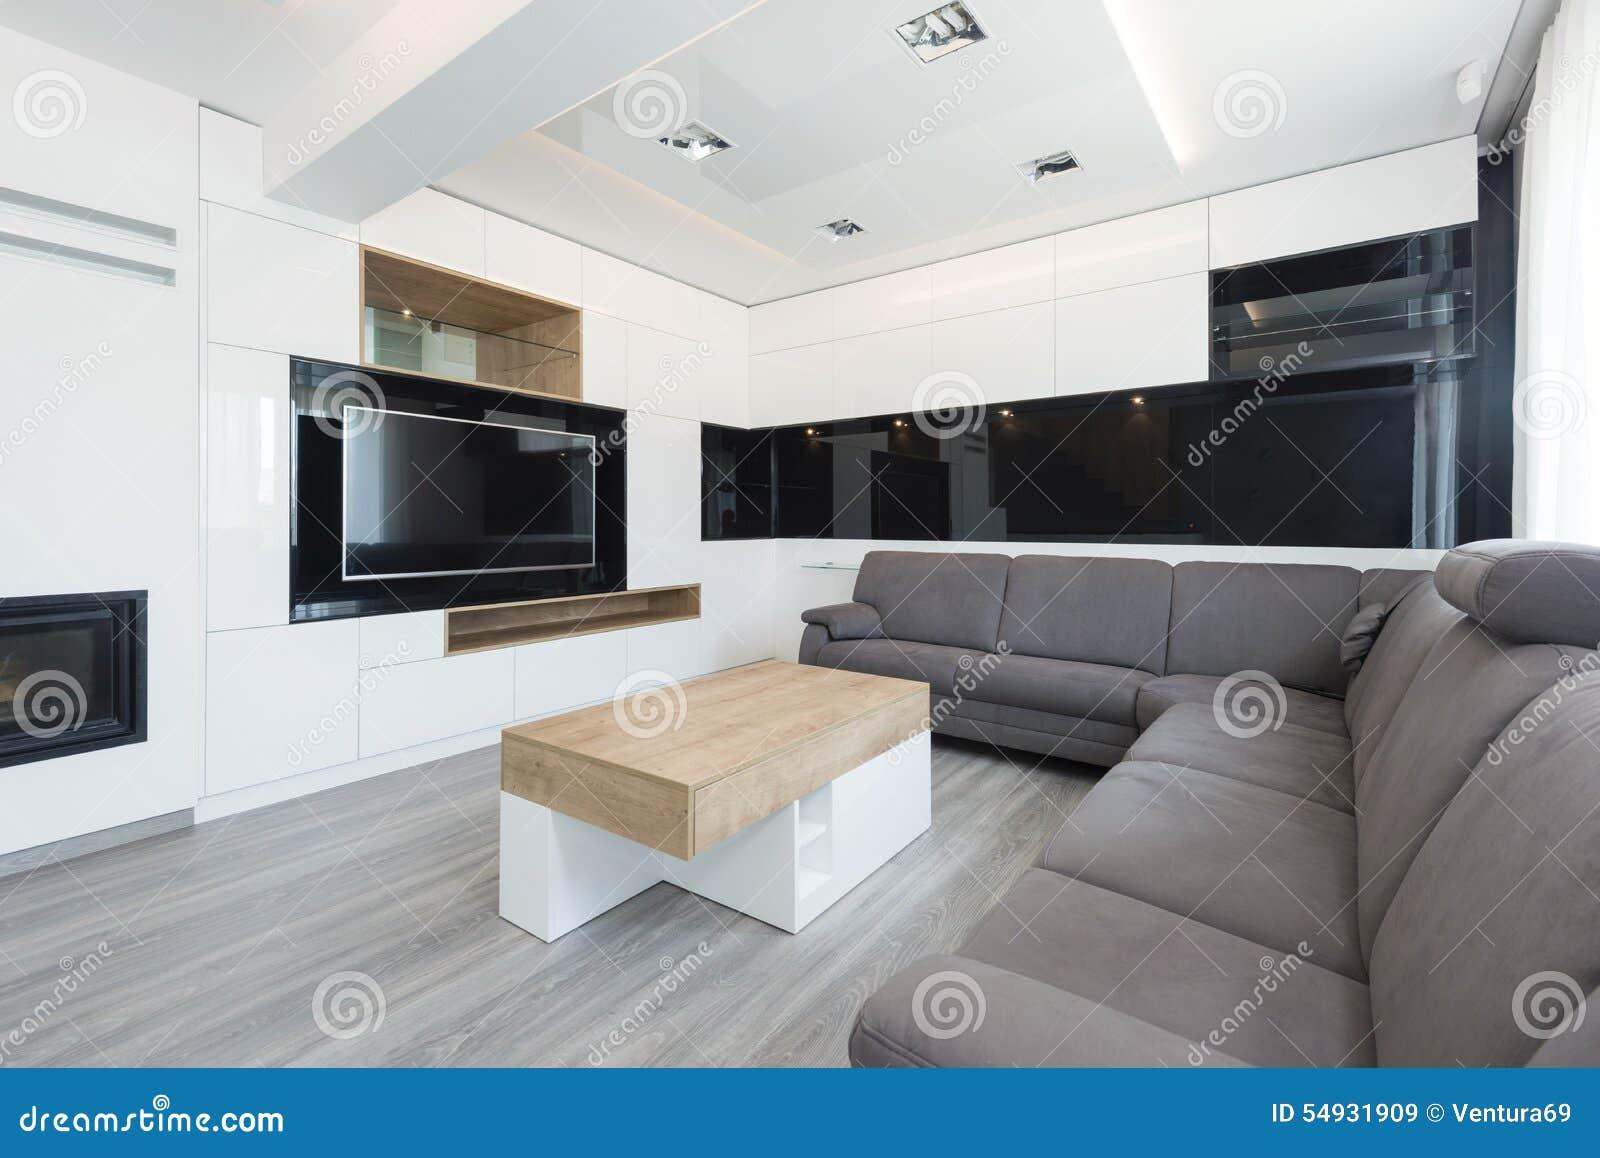 Beau Salon Moderne